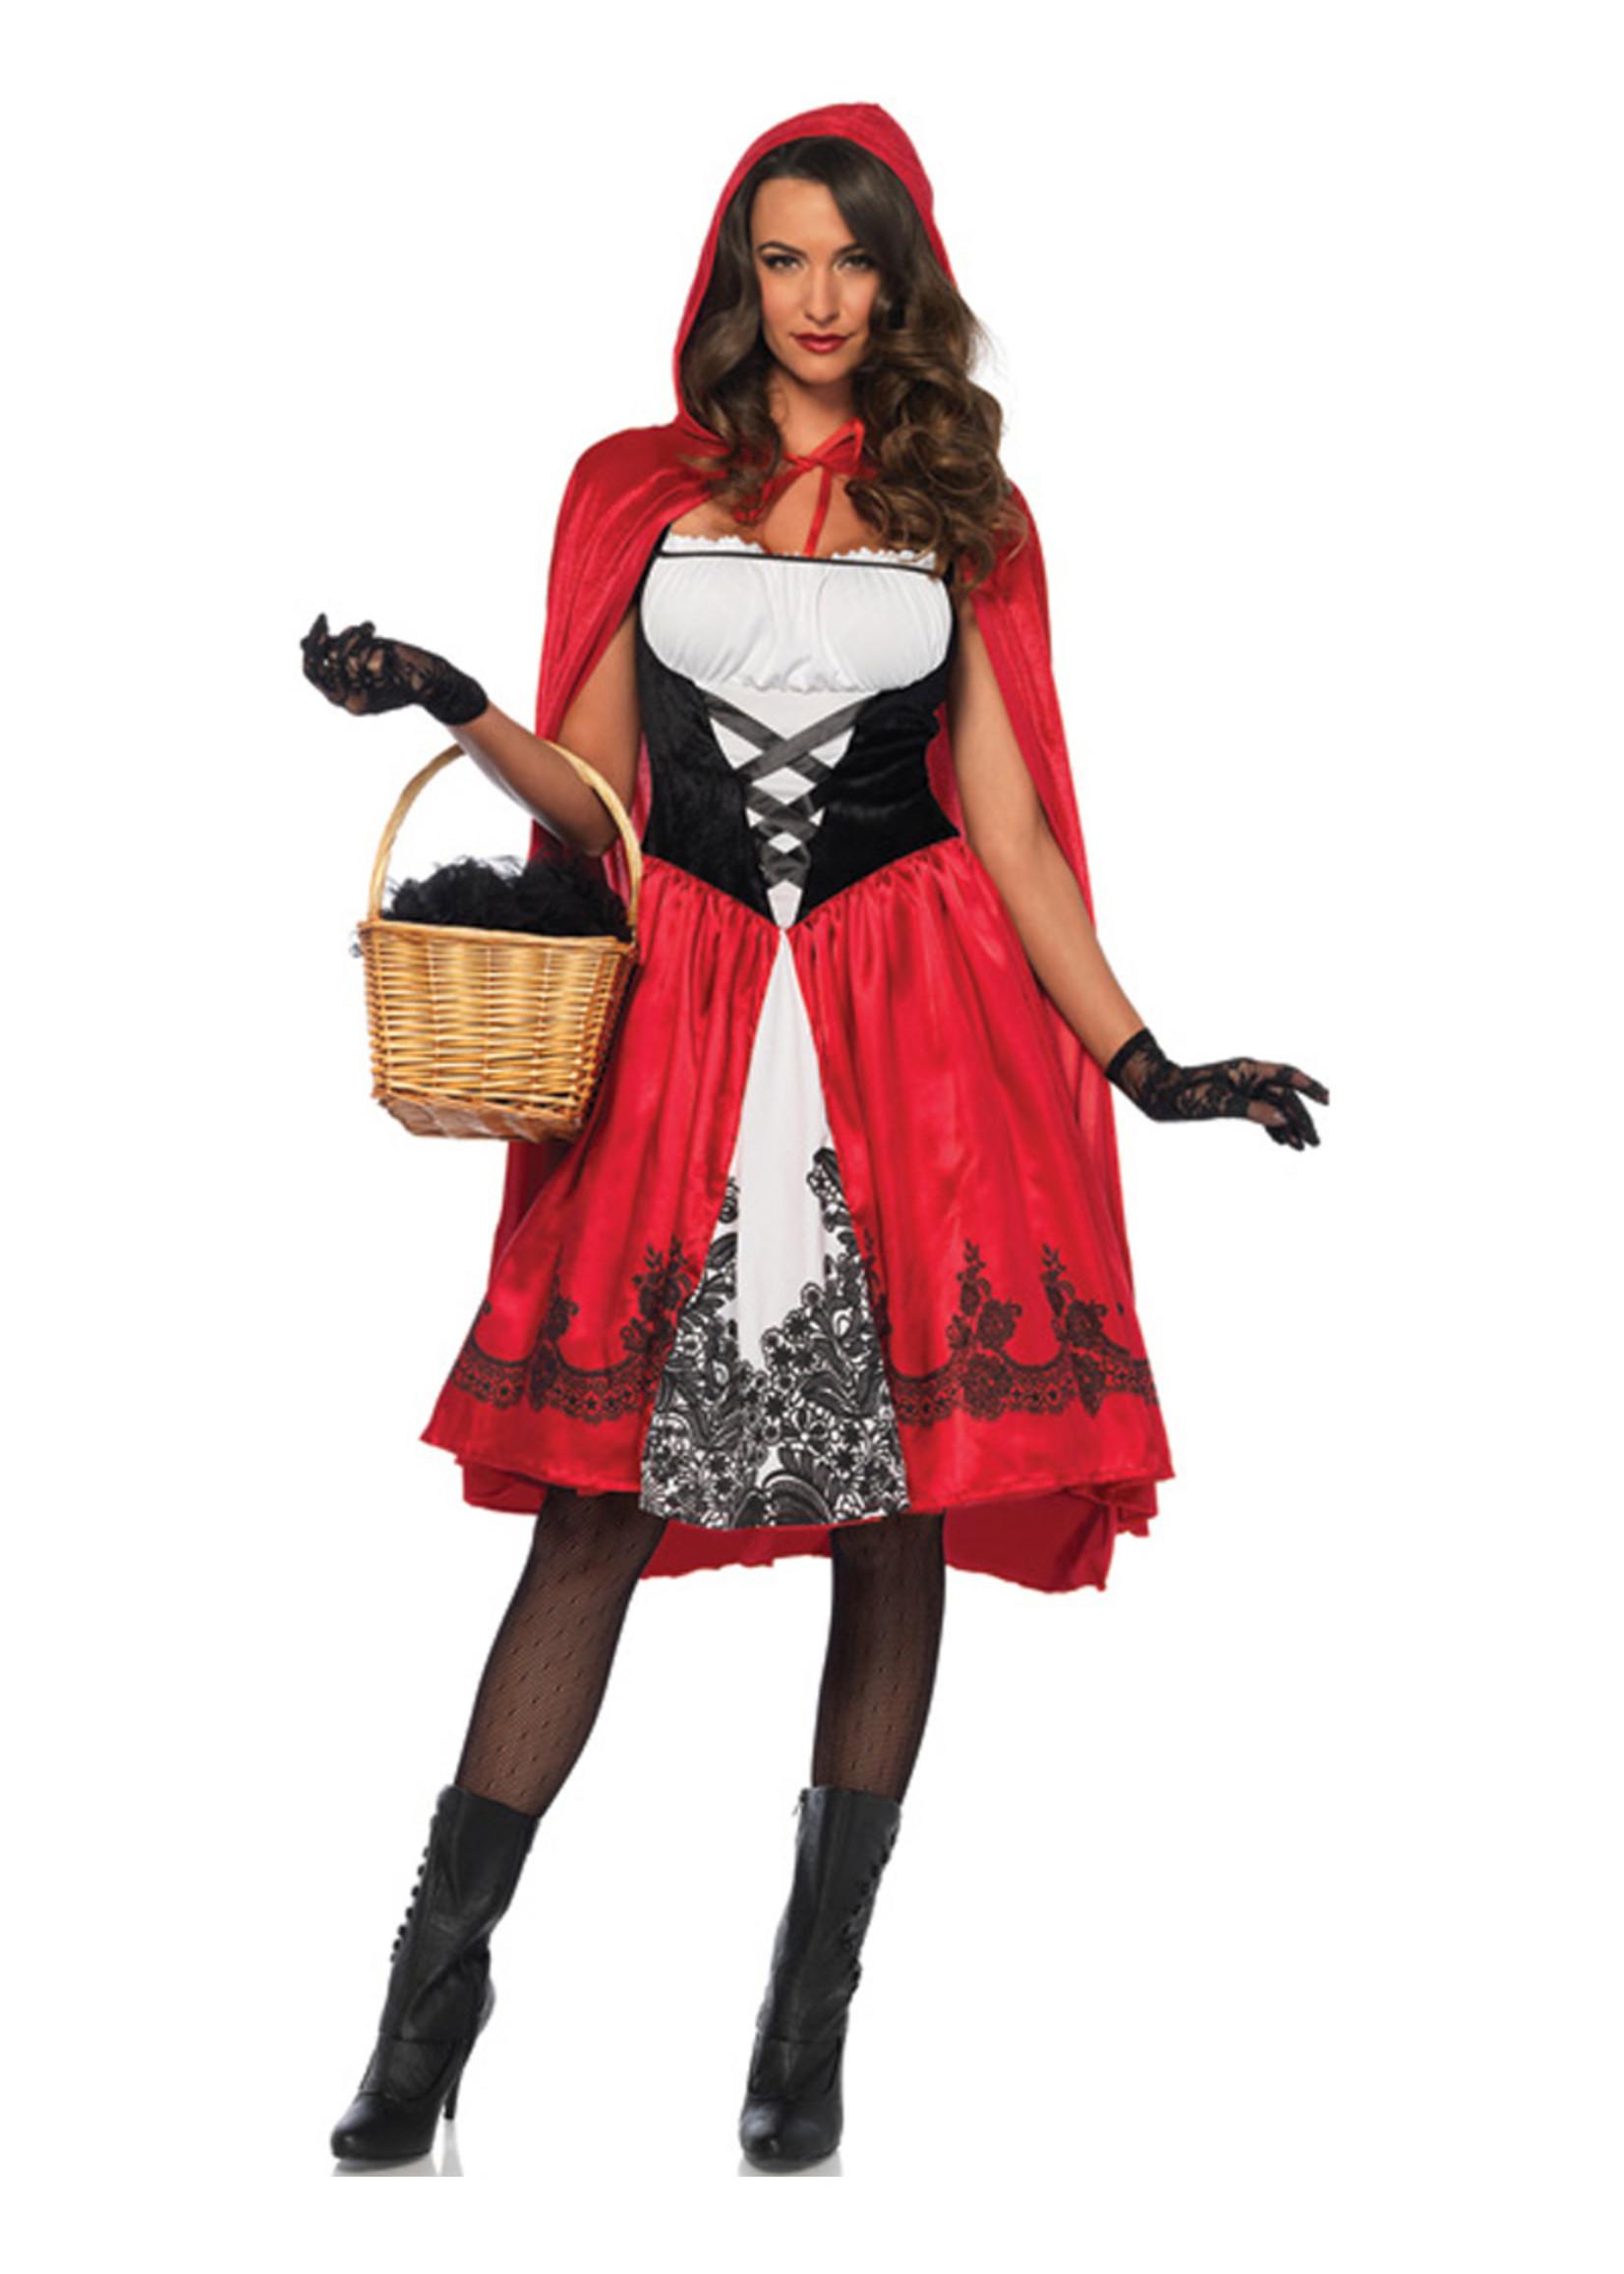 LEG AVENUE Classic Red Riding Hood Costume - Women's